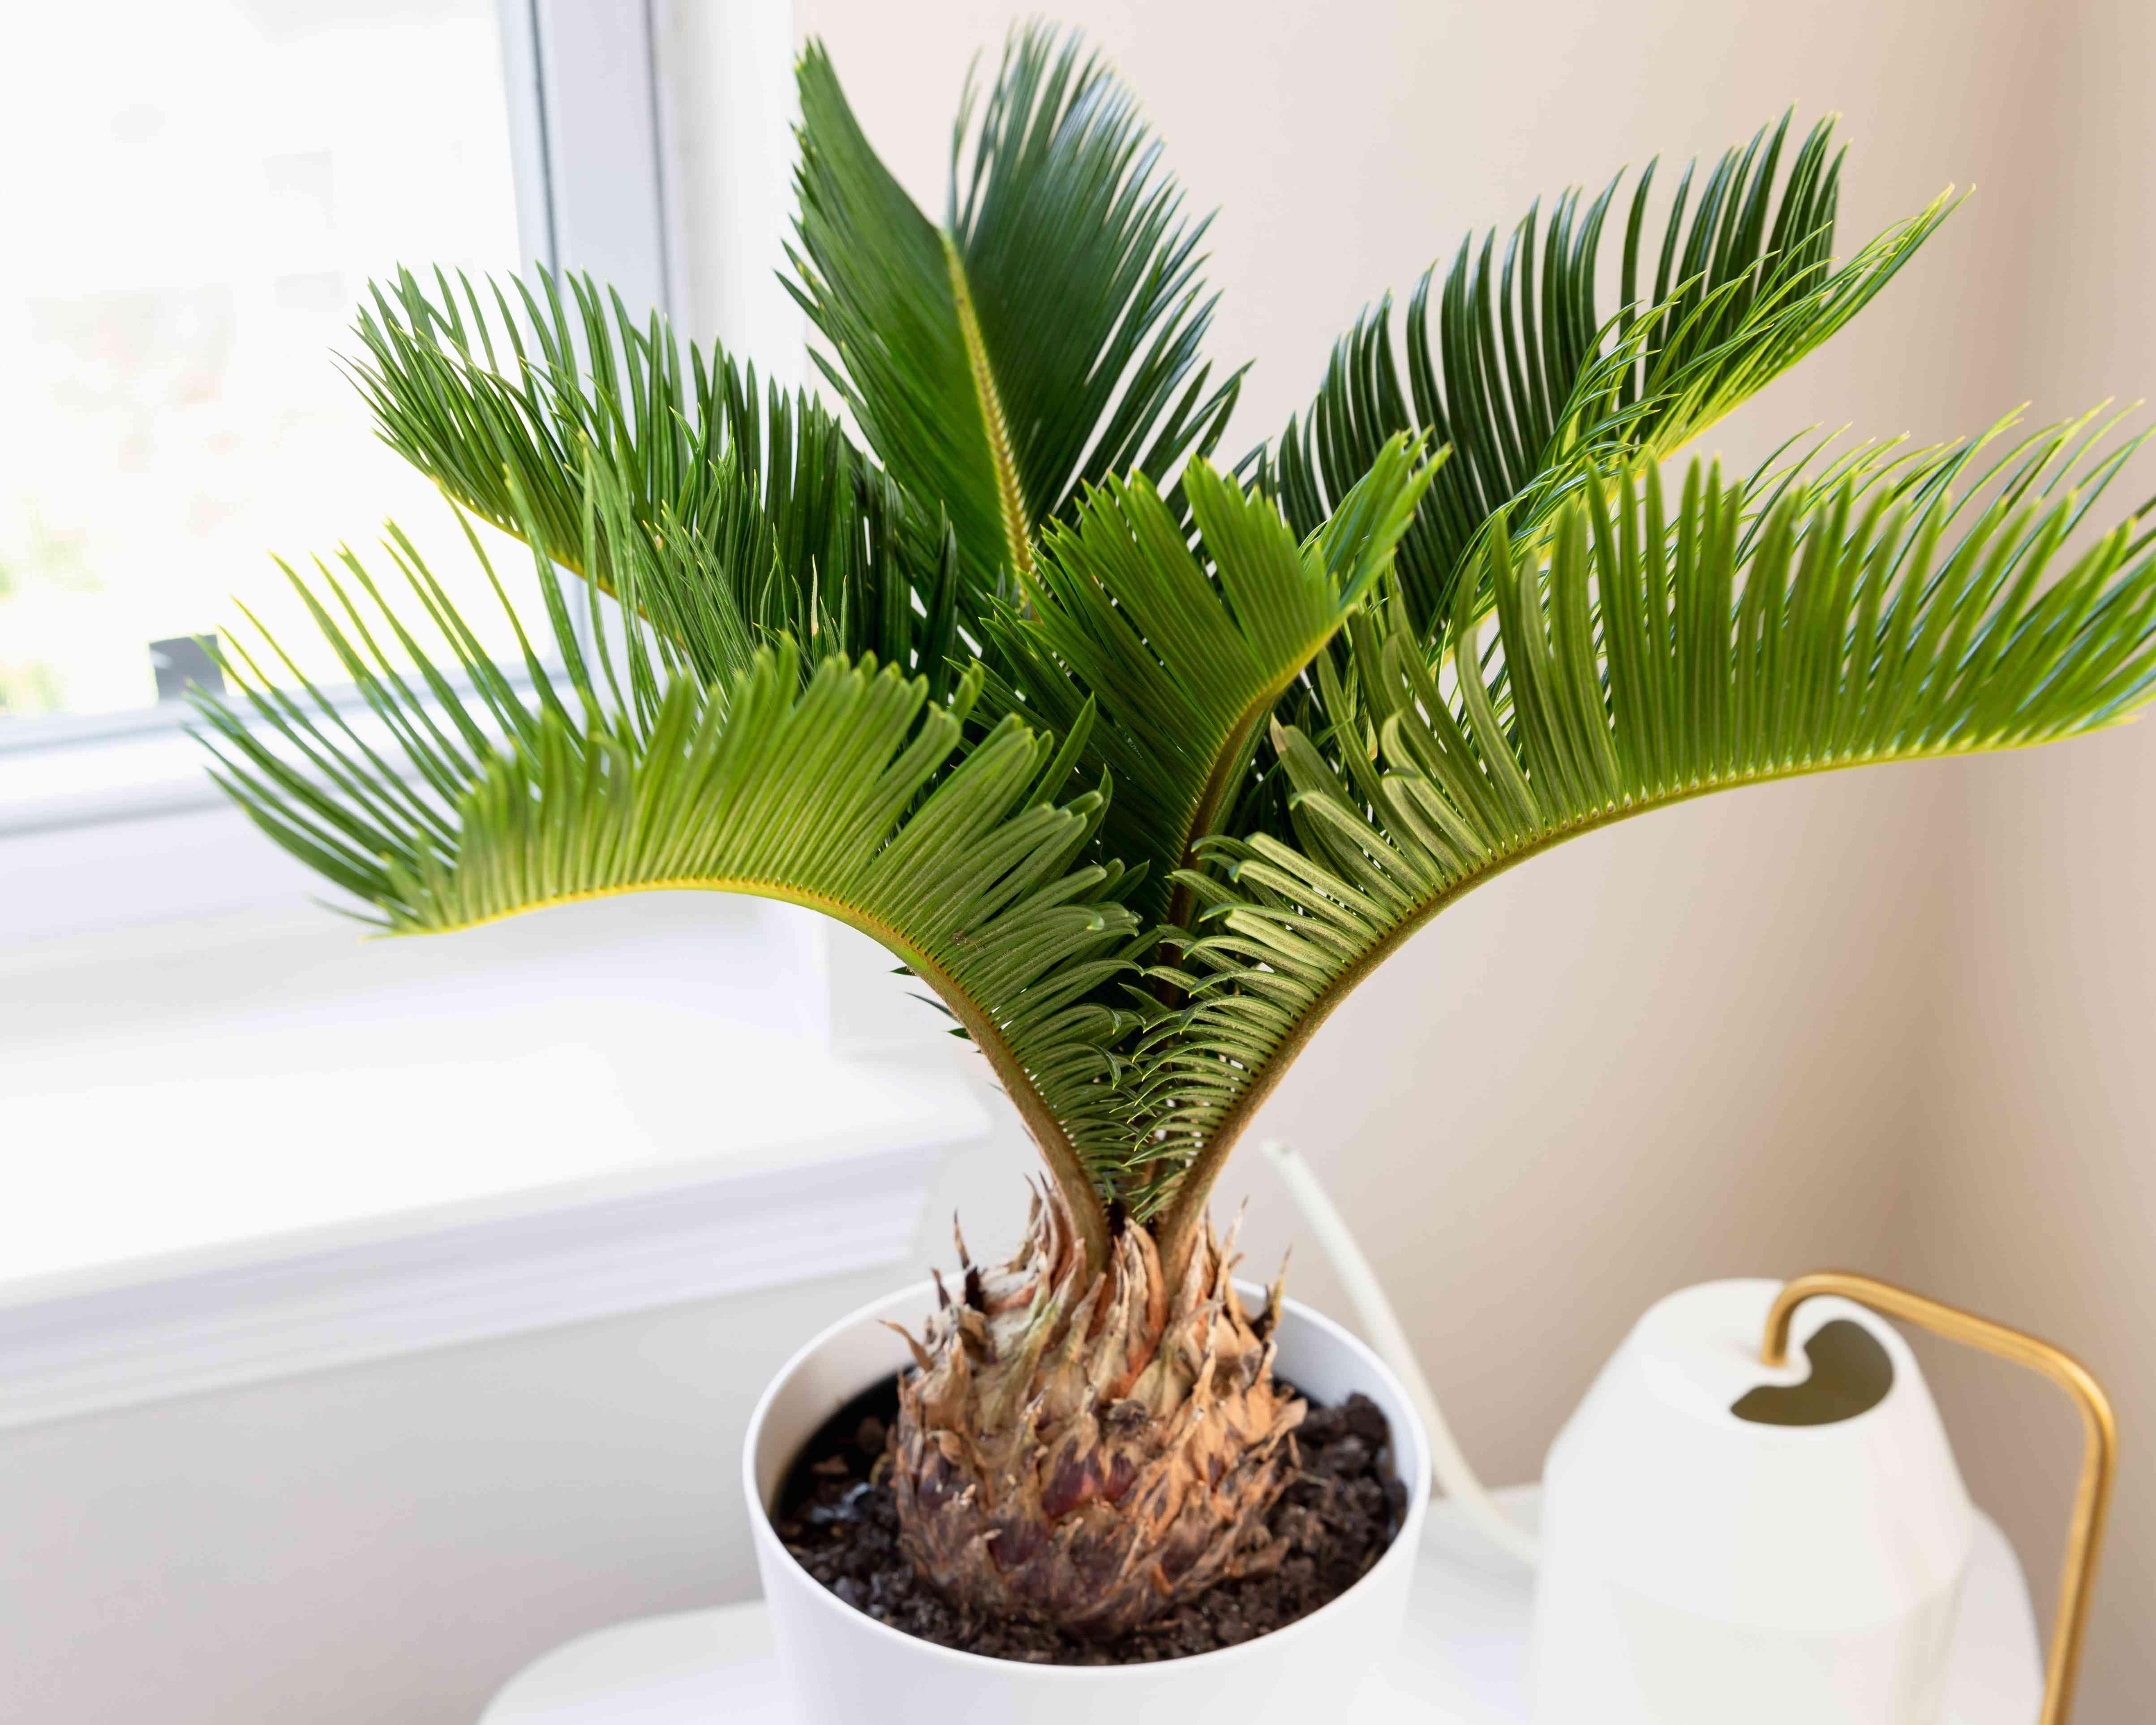 sago palm by a window